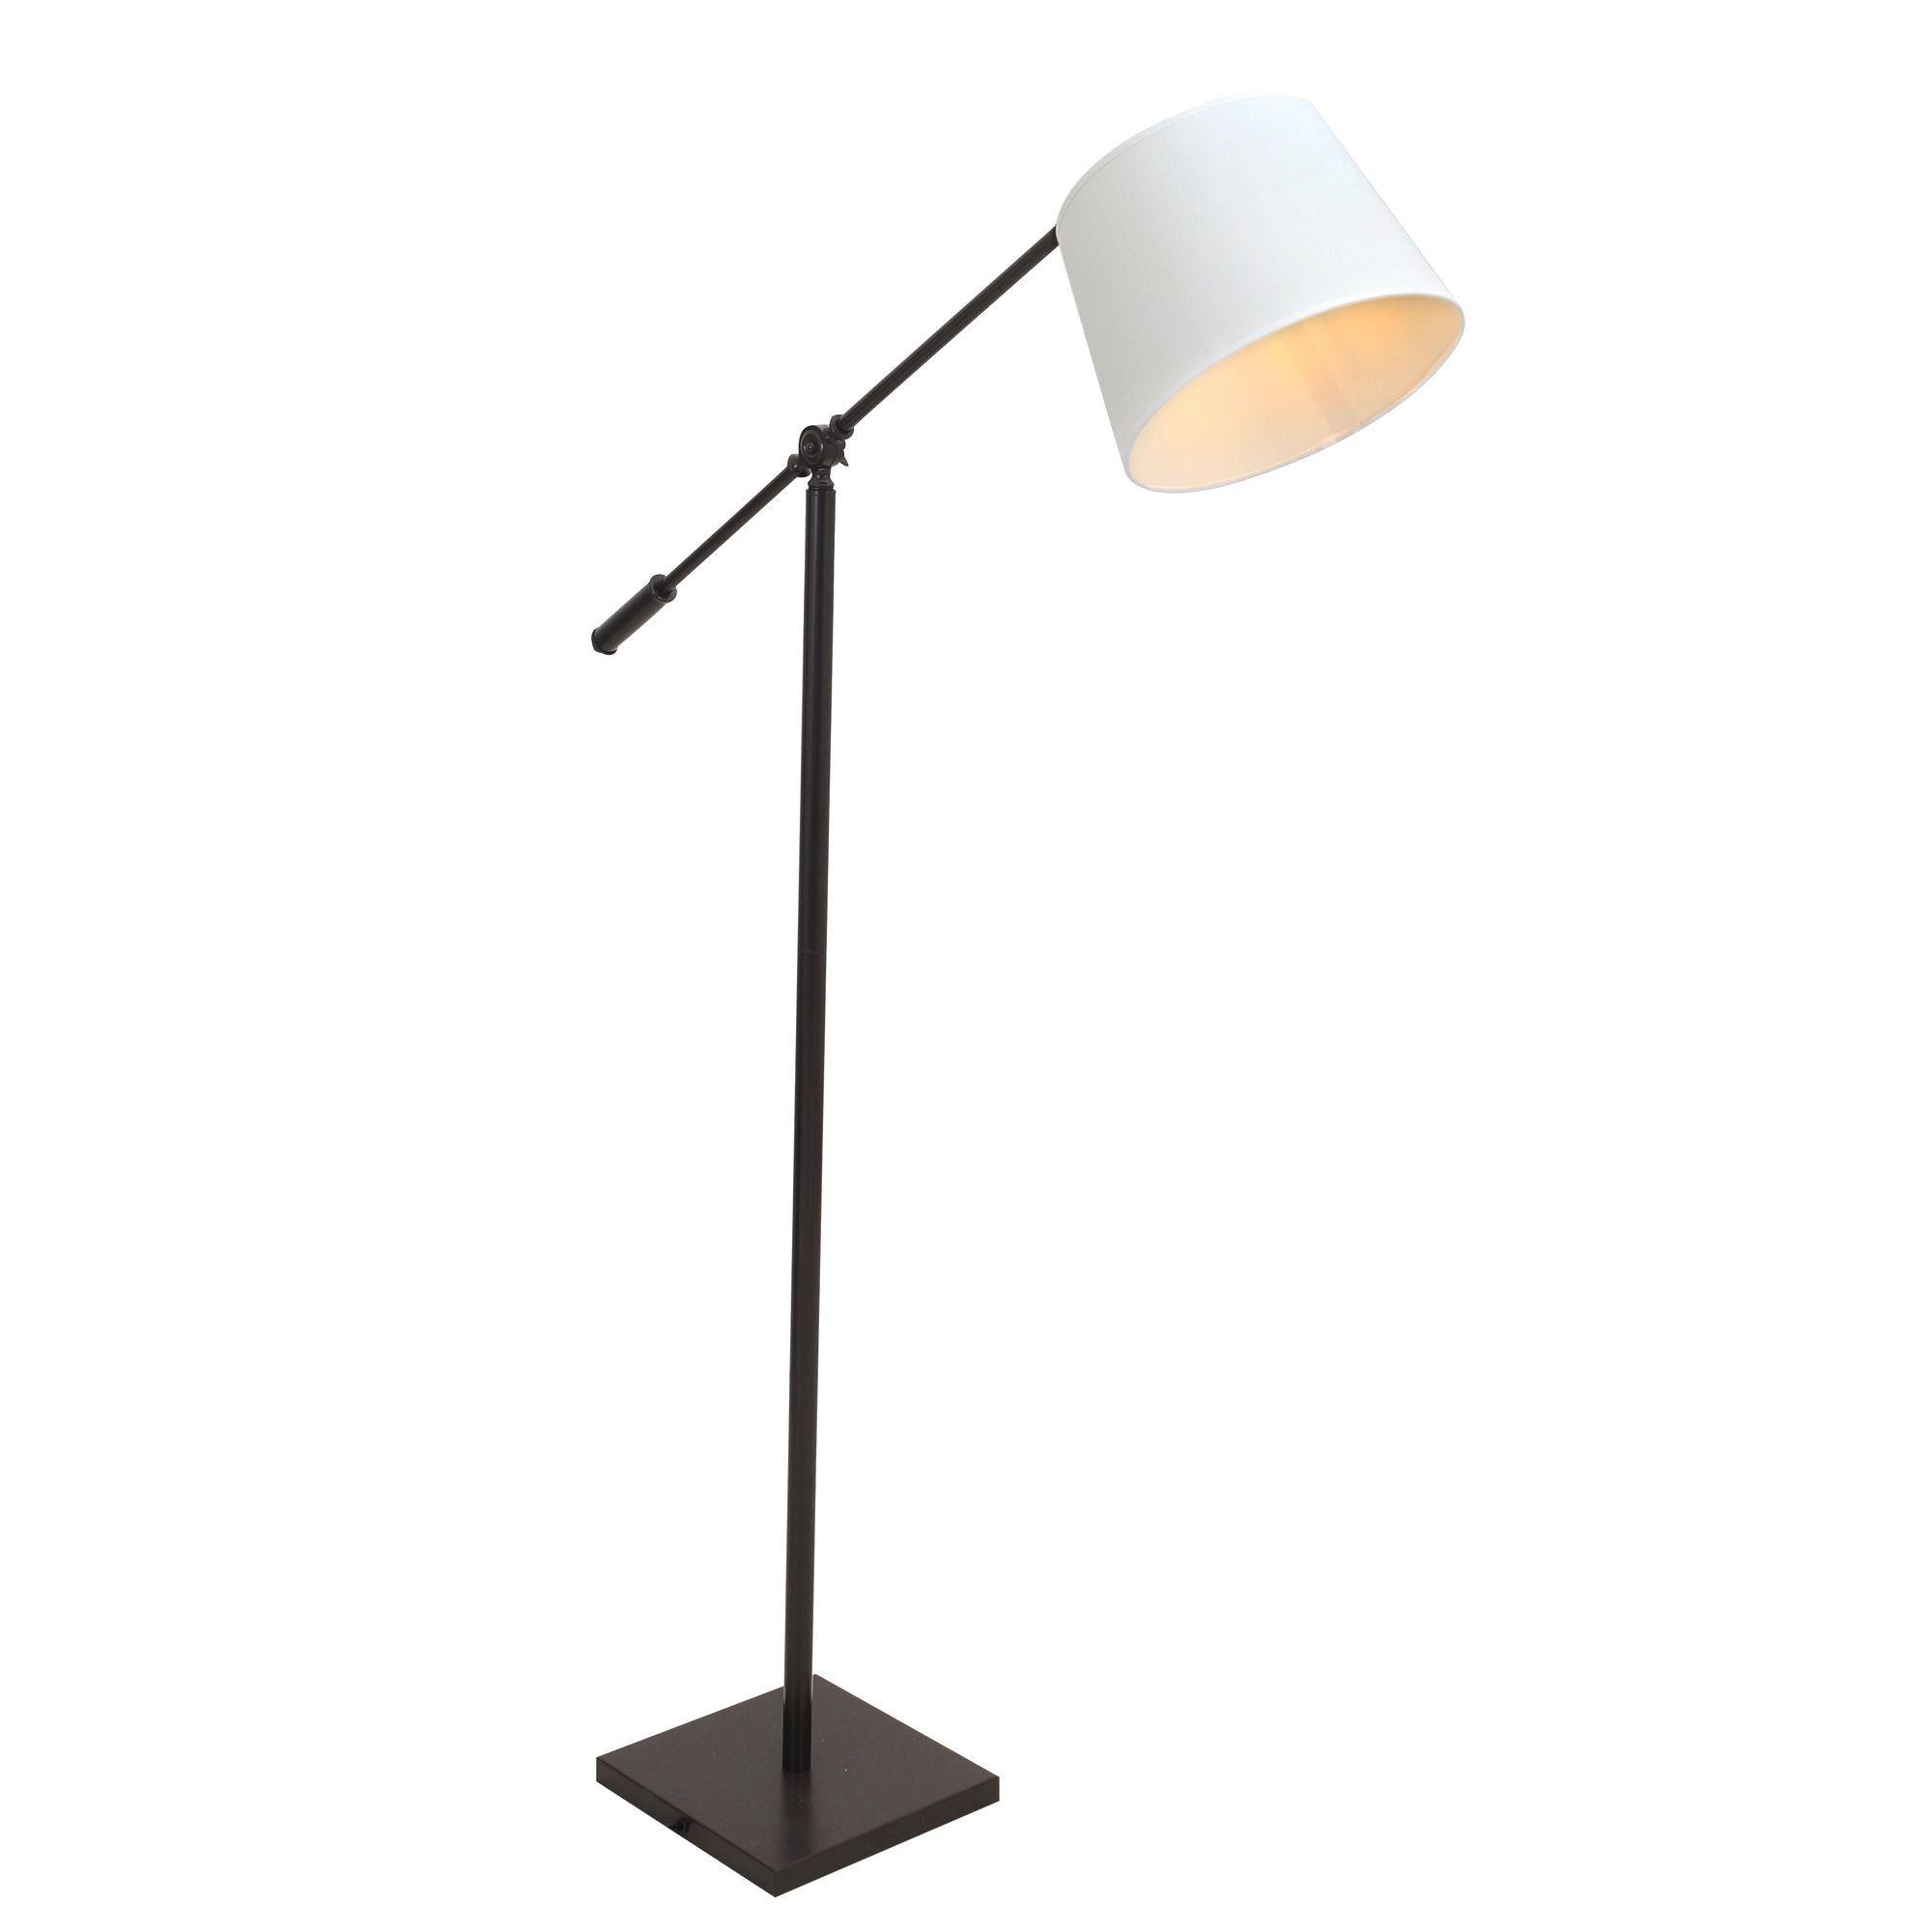 Piper Floor Lamp By Target Contemporary Floor Lamps Floor Lamp Industrial Floor Lamps